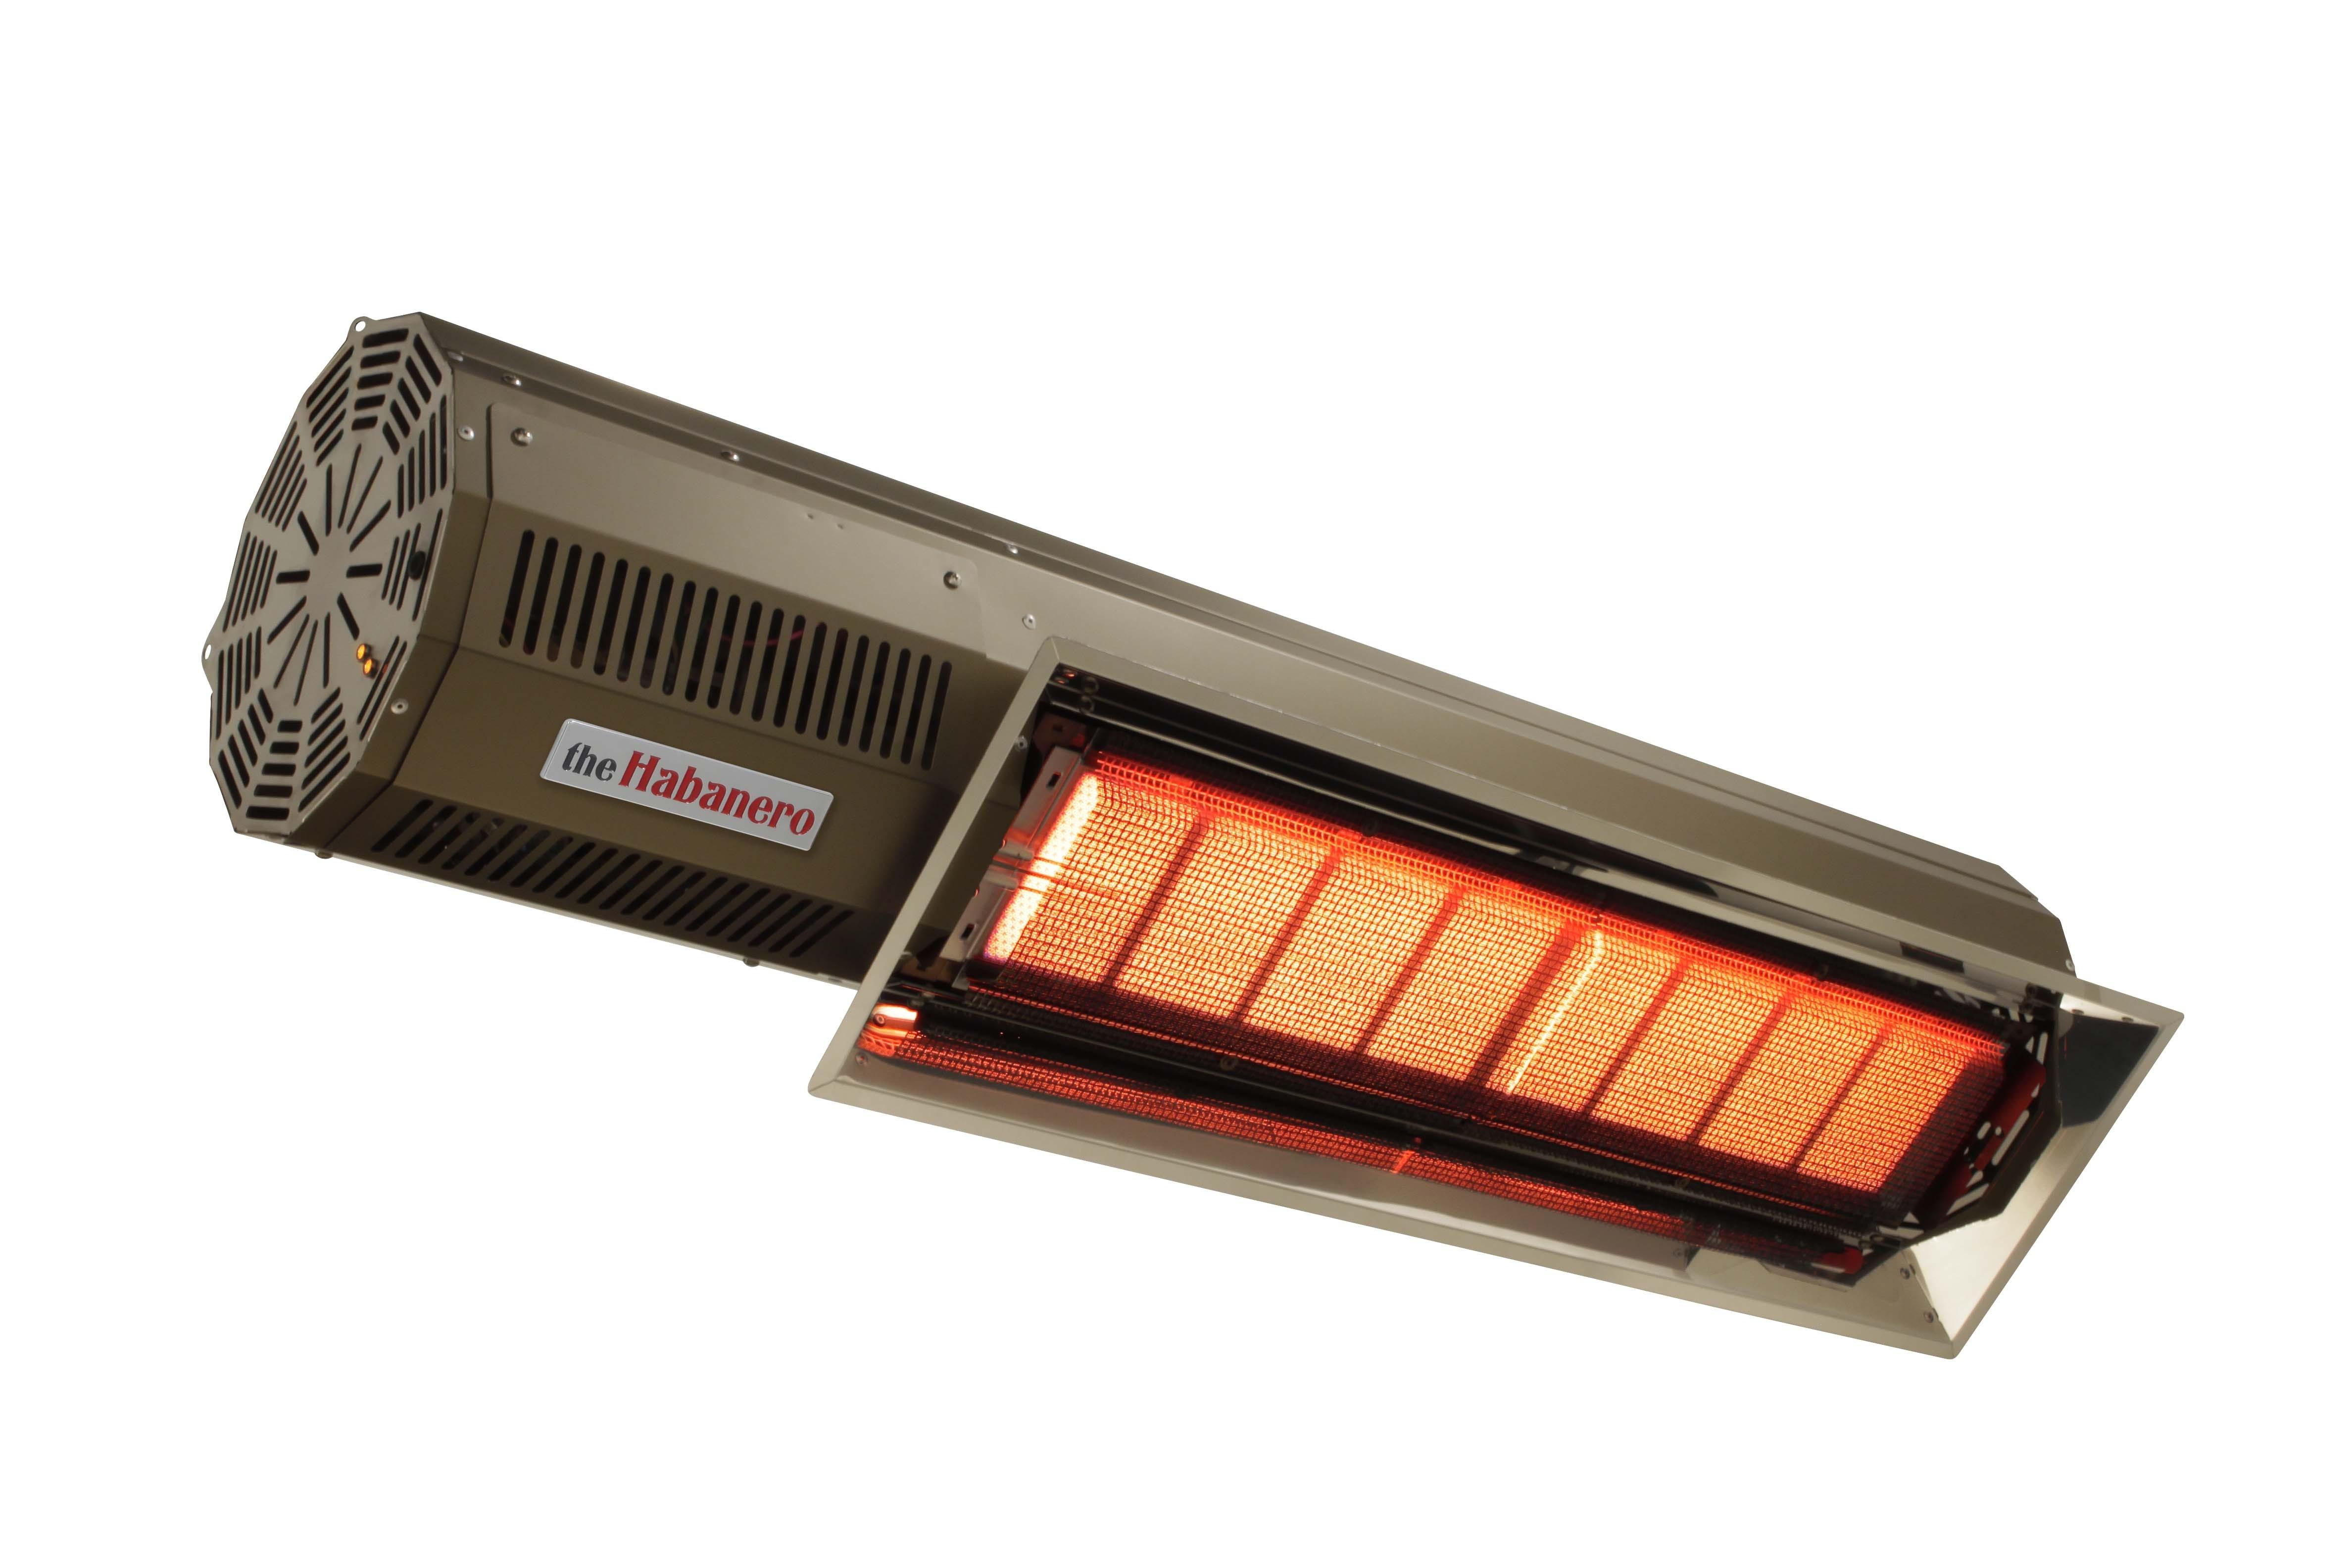 Habanero M40 | M50 Patio Heater, Black